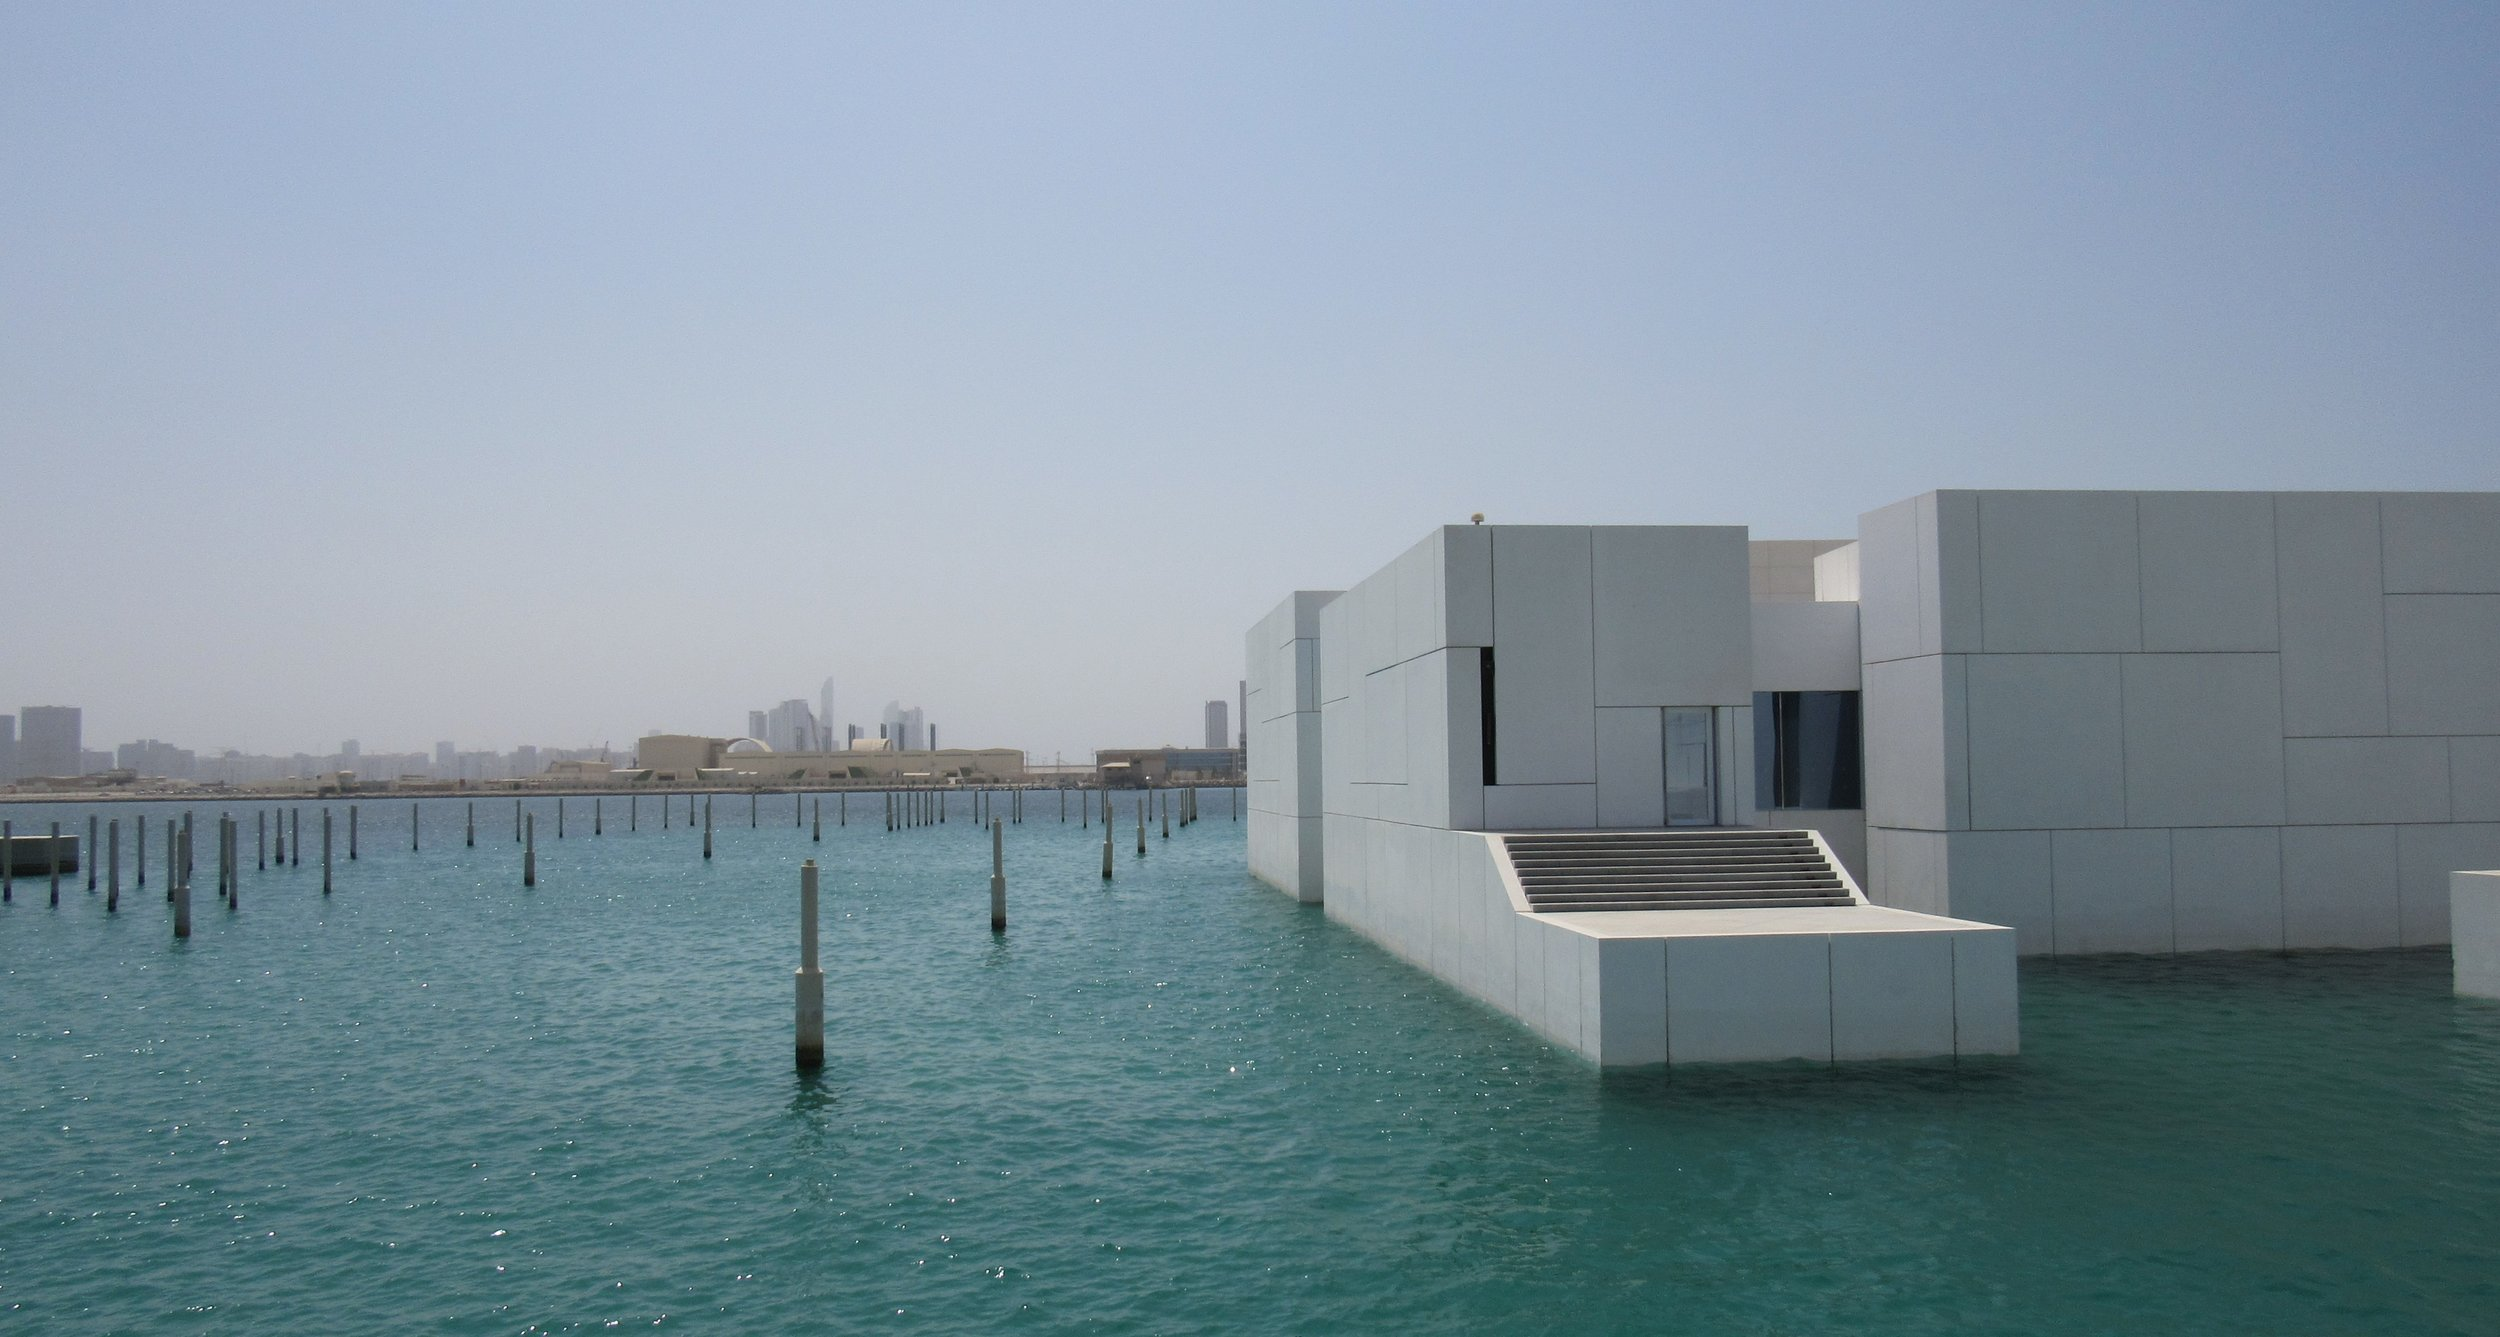 Louvre Abu Dhabi © Flyga Twiga LLC